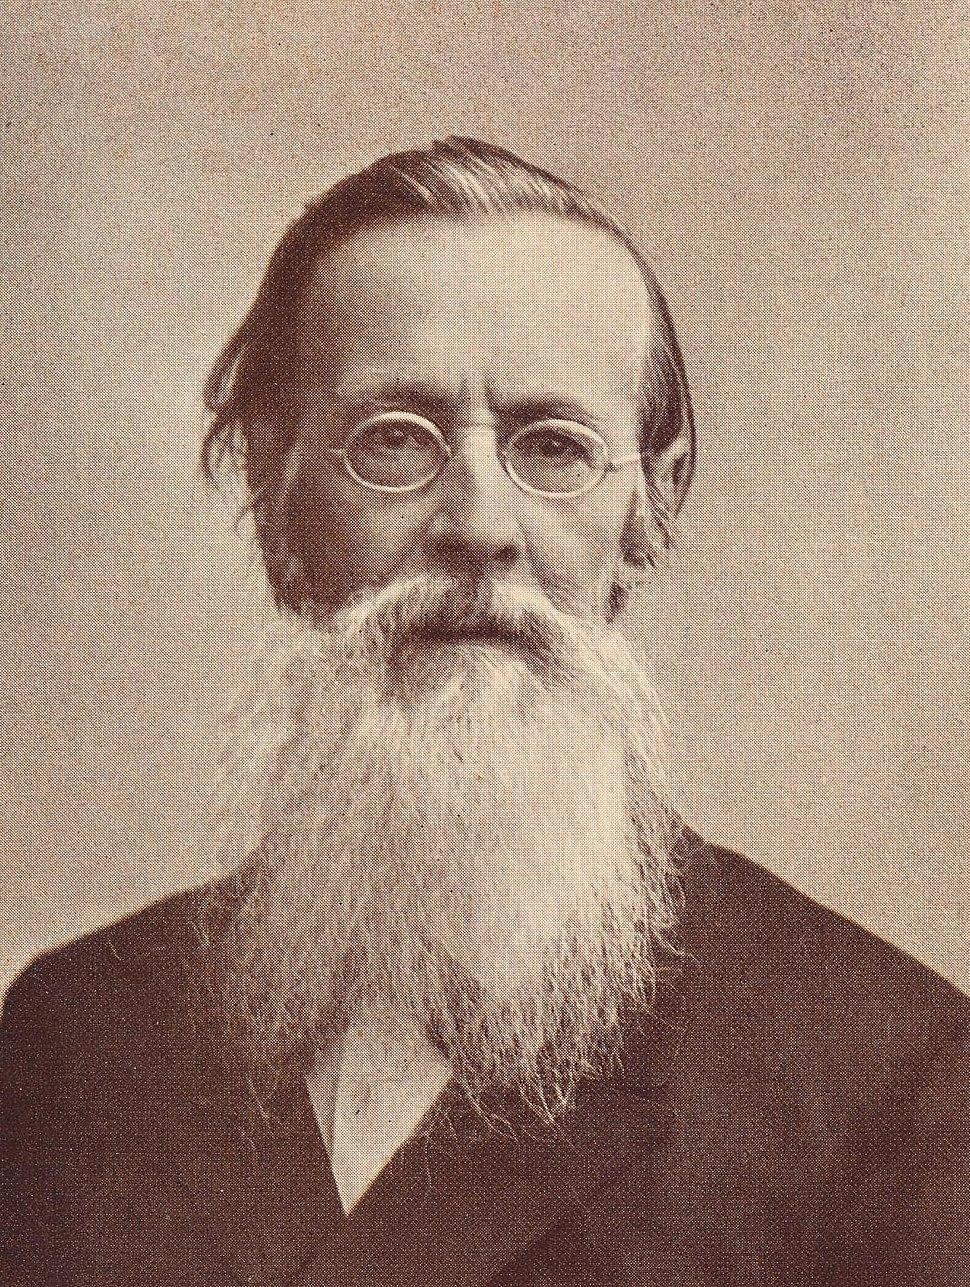 Apollon Grigoriev - Russian poet, literary critic and translator. Biography, creativity 35